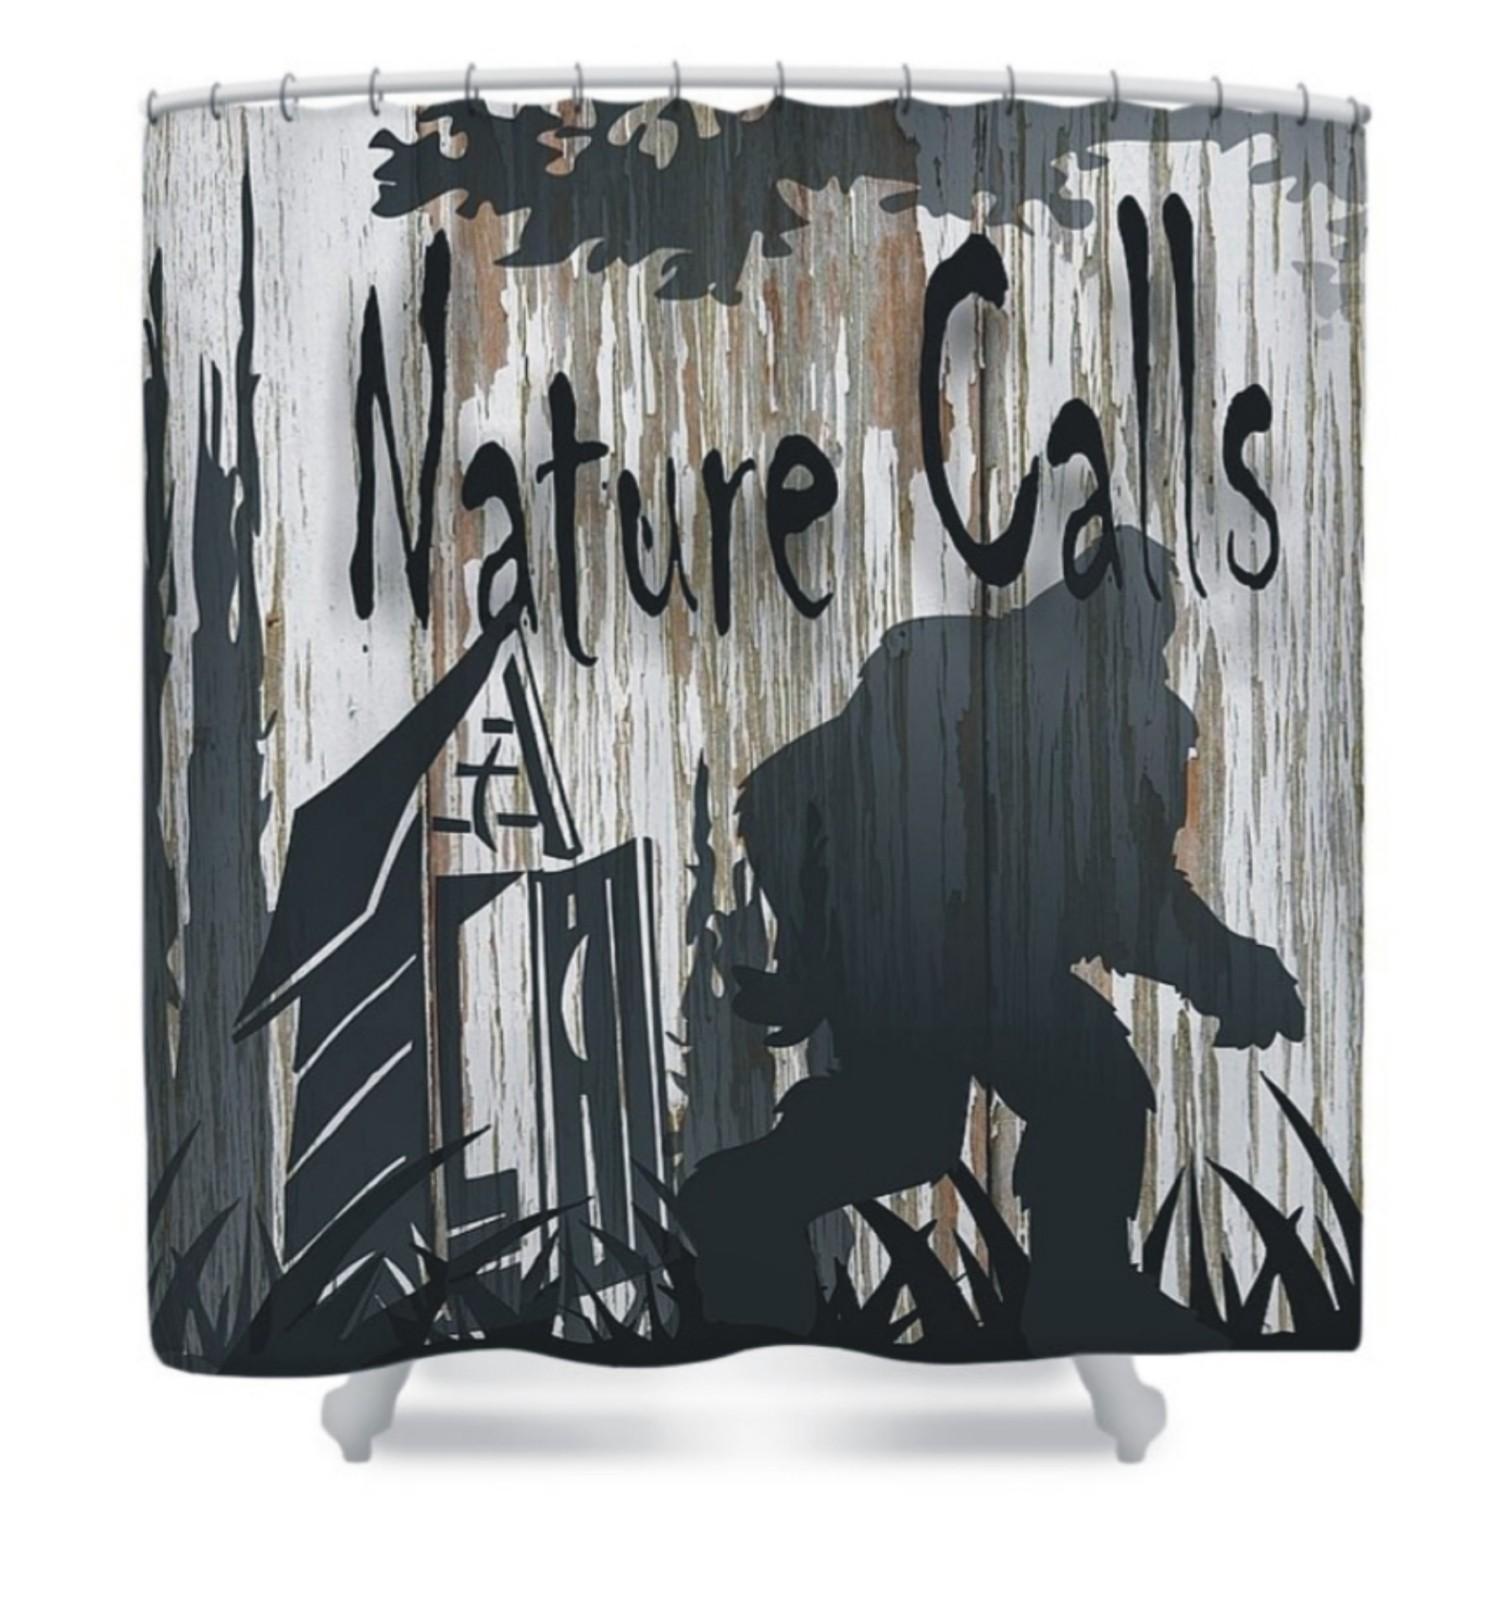 bigfoot nature calls shower curtain